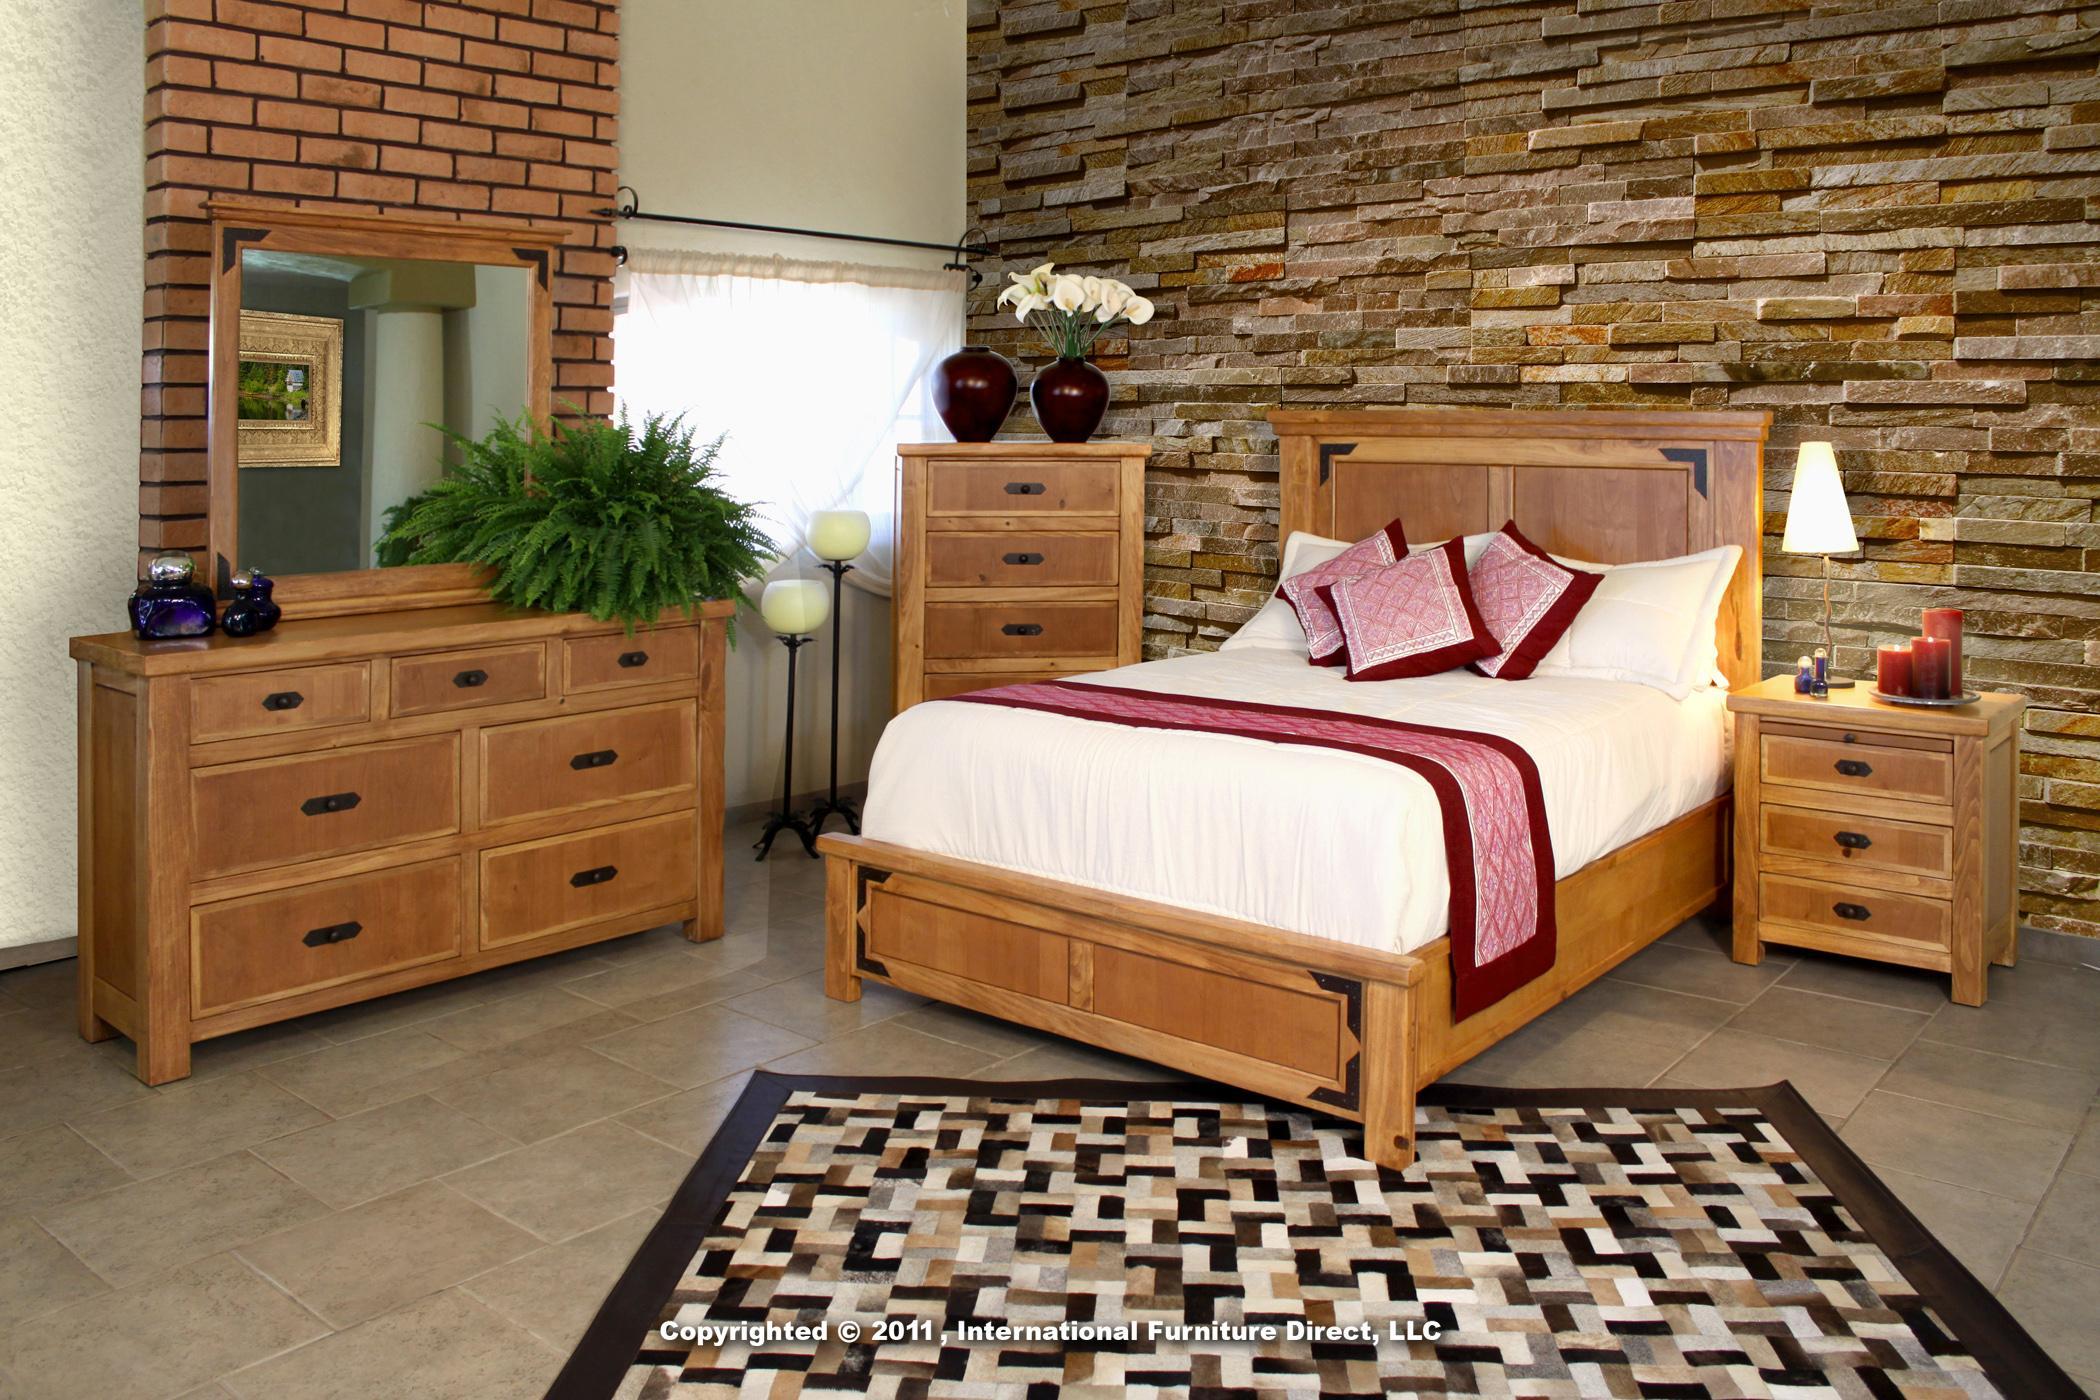 Lodge Bedroom Furniture International Furniture Direct Lodge End Table